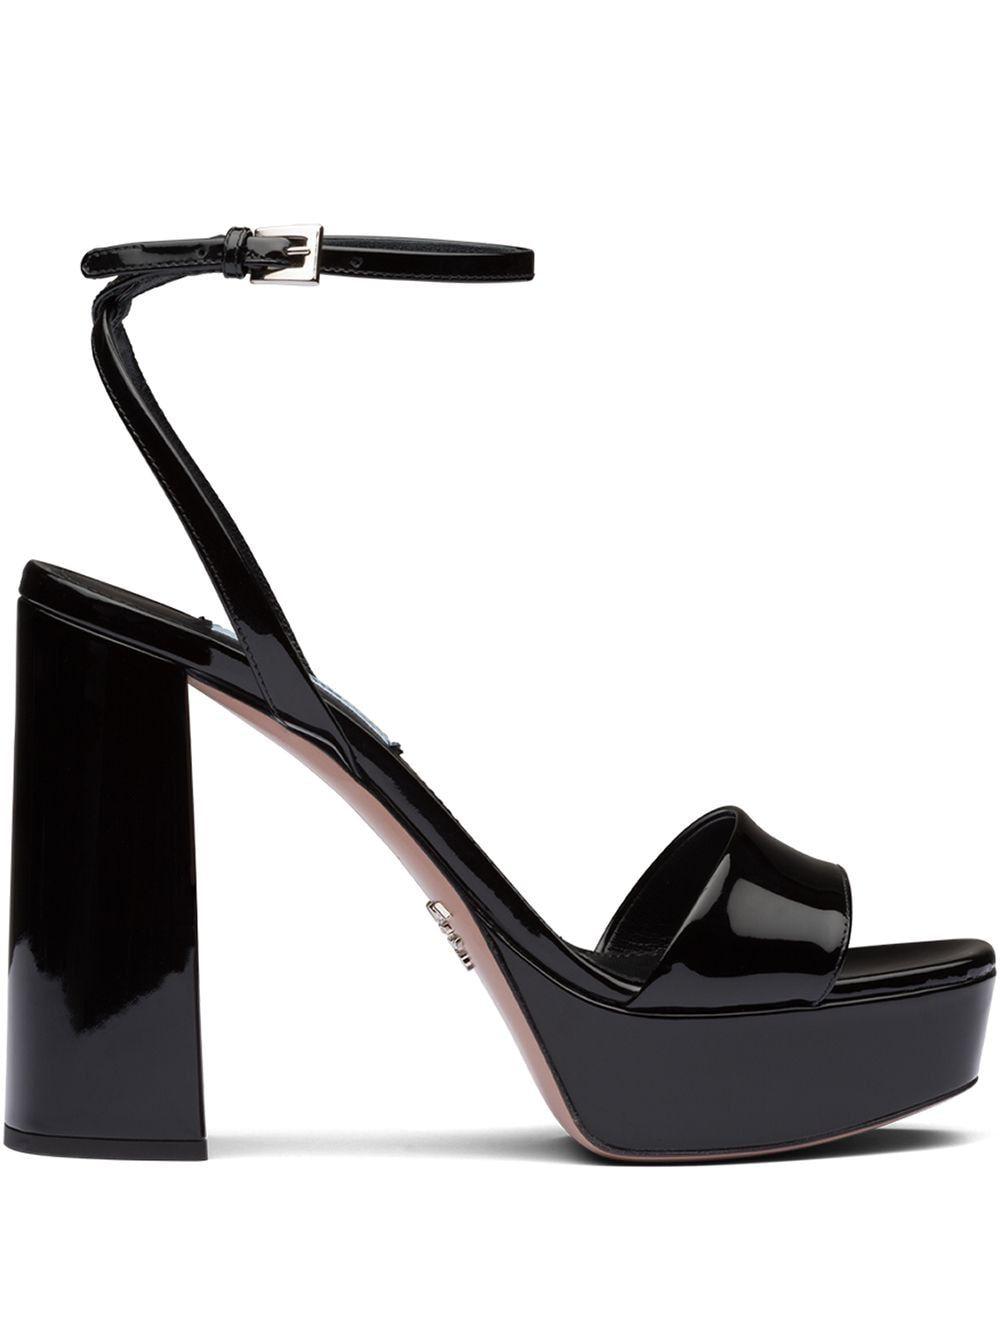 Prada Ankle Strap Platform Sandal In Black Modesens In 2020 Platform Sandals Footwear Design Women Sandals